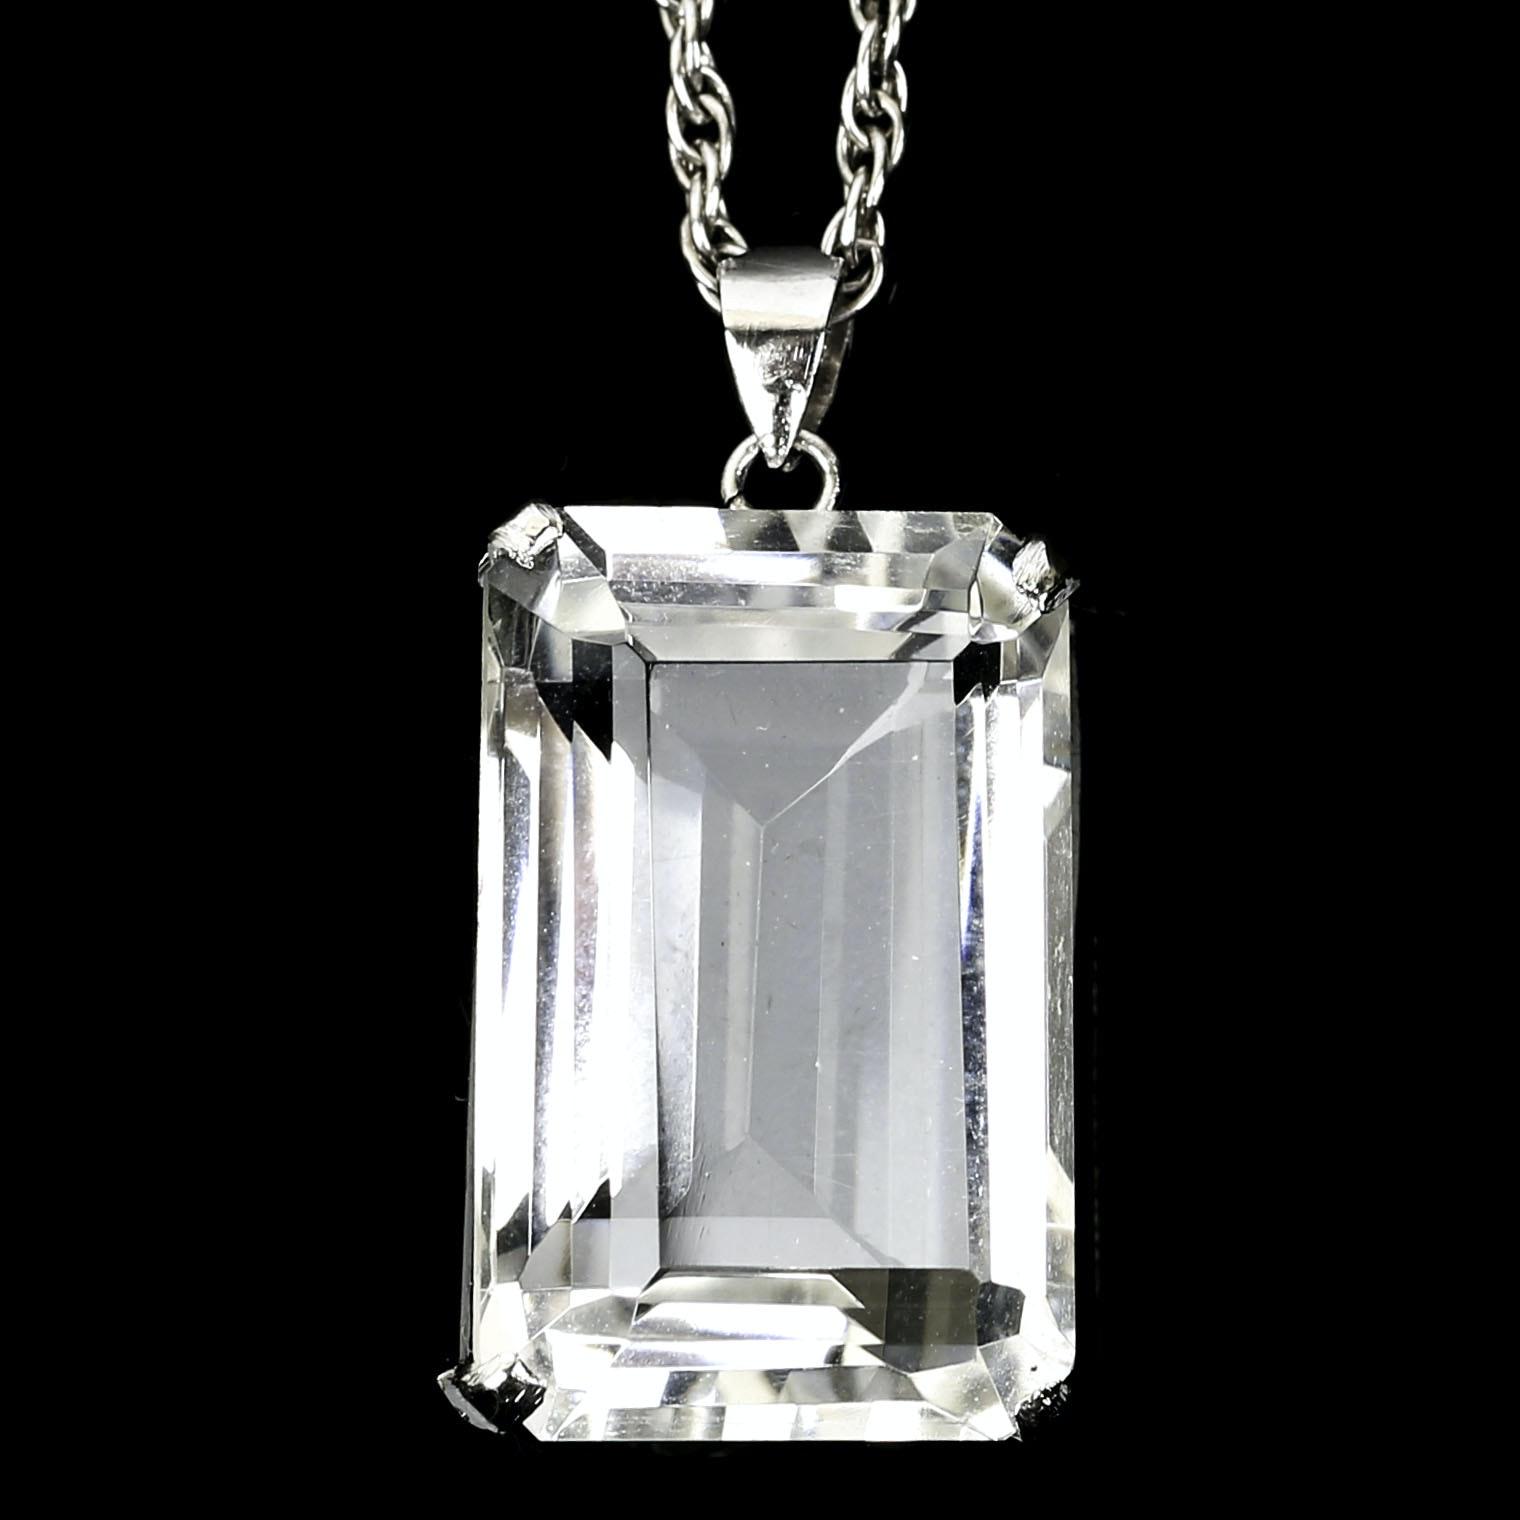 Sterling Silver 25.00 CT Quartz Crystal Pendant Necklace